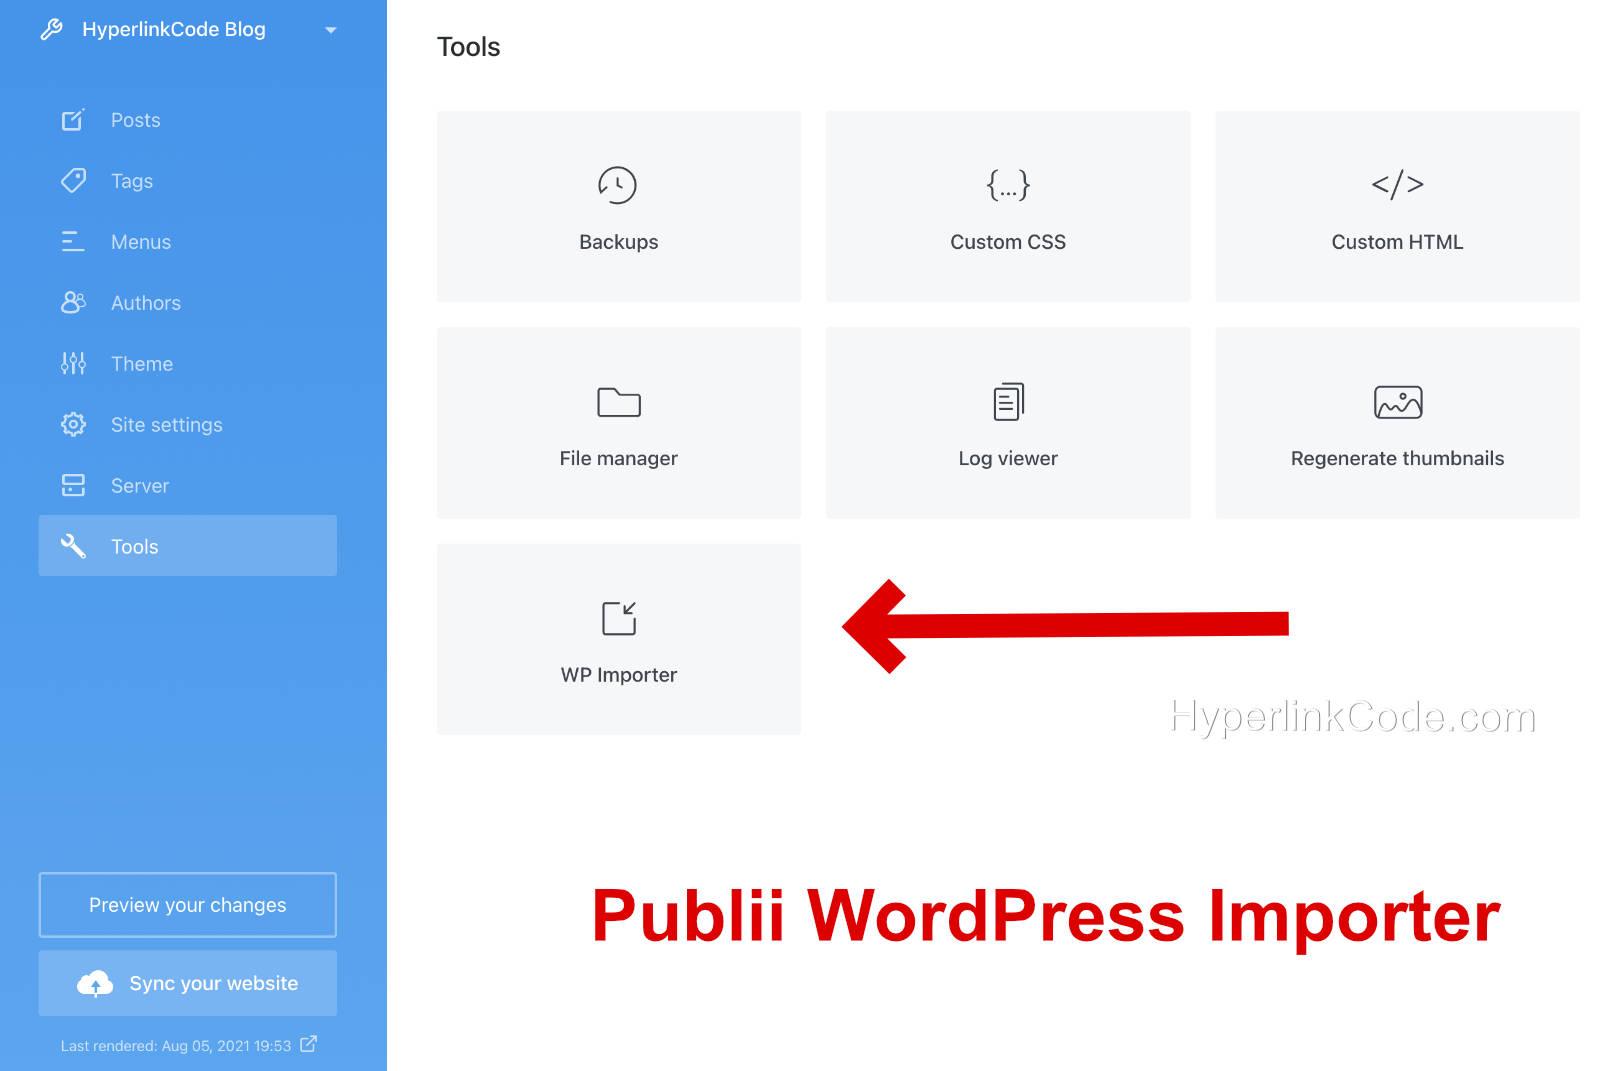 Publii WordPress Importer Tool